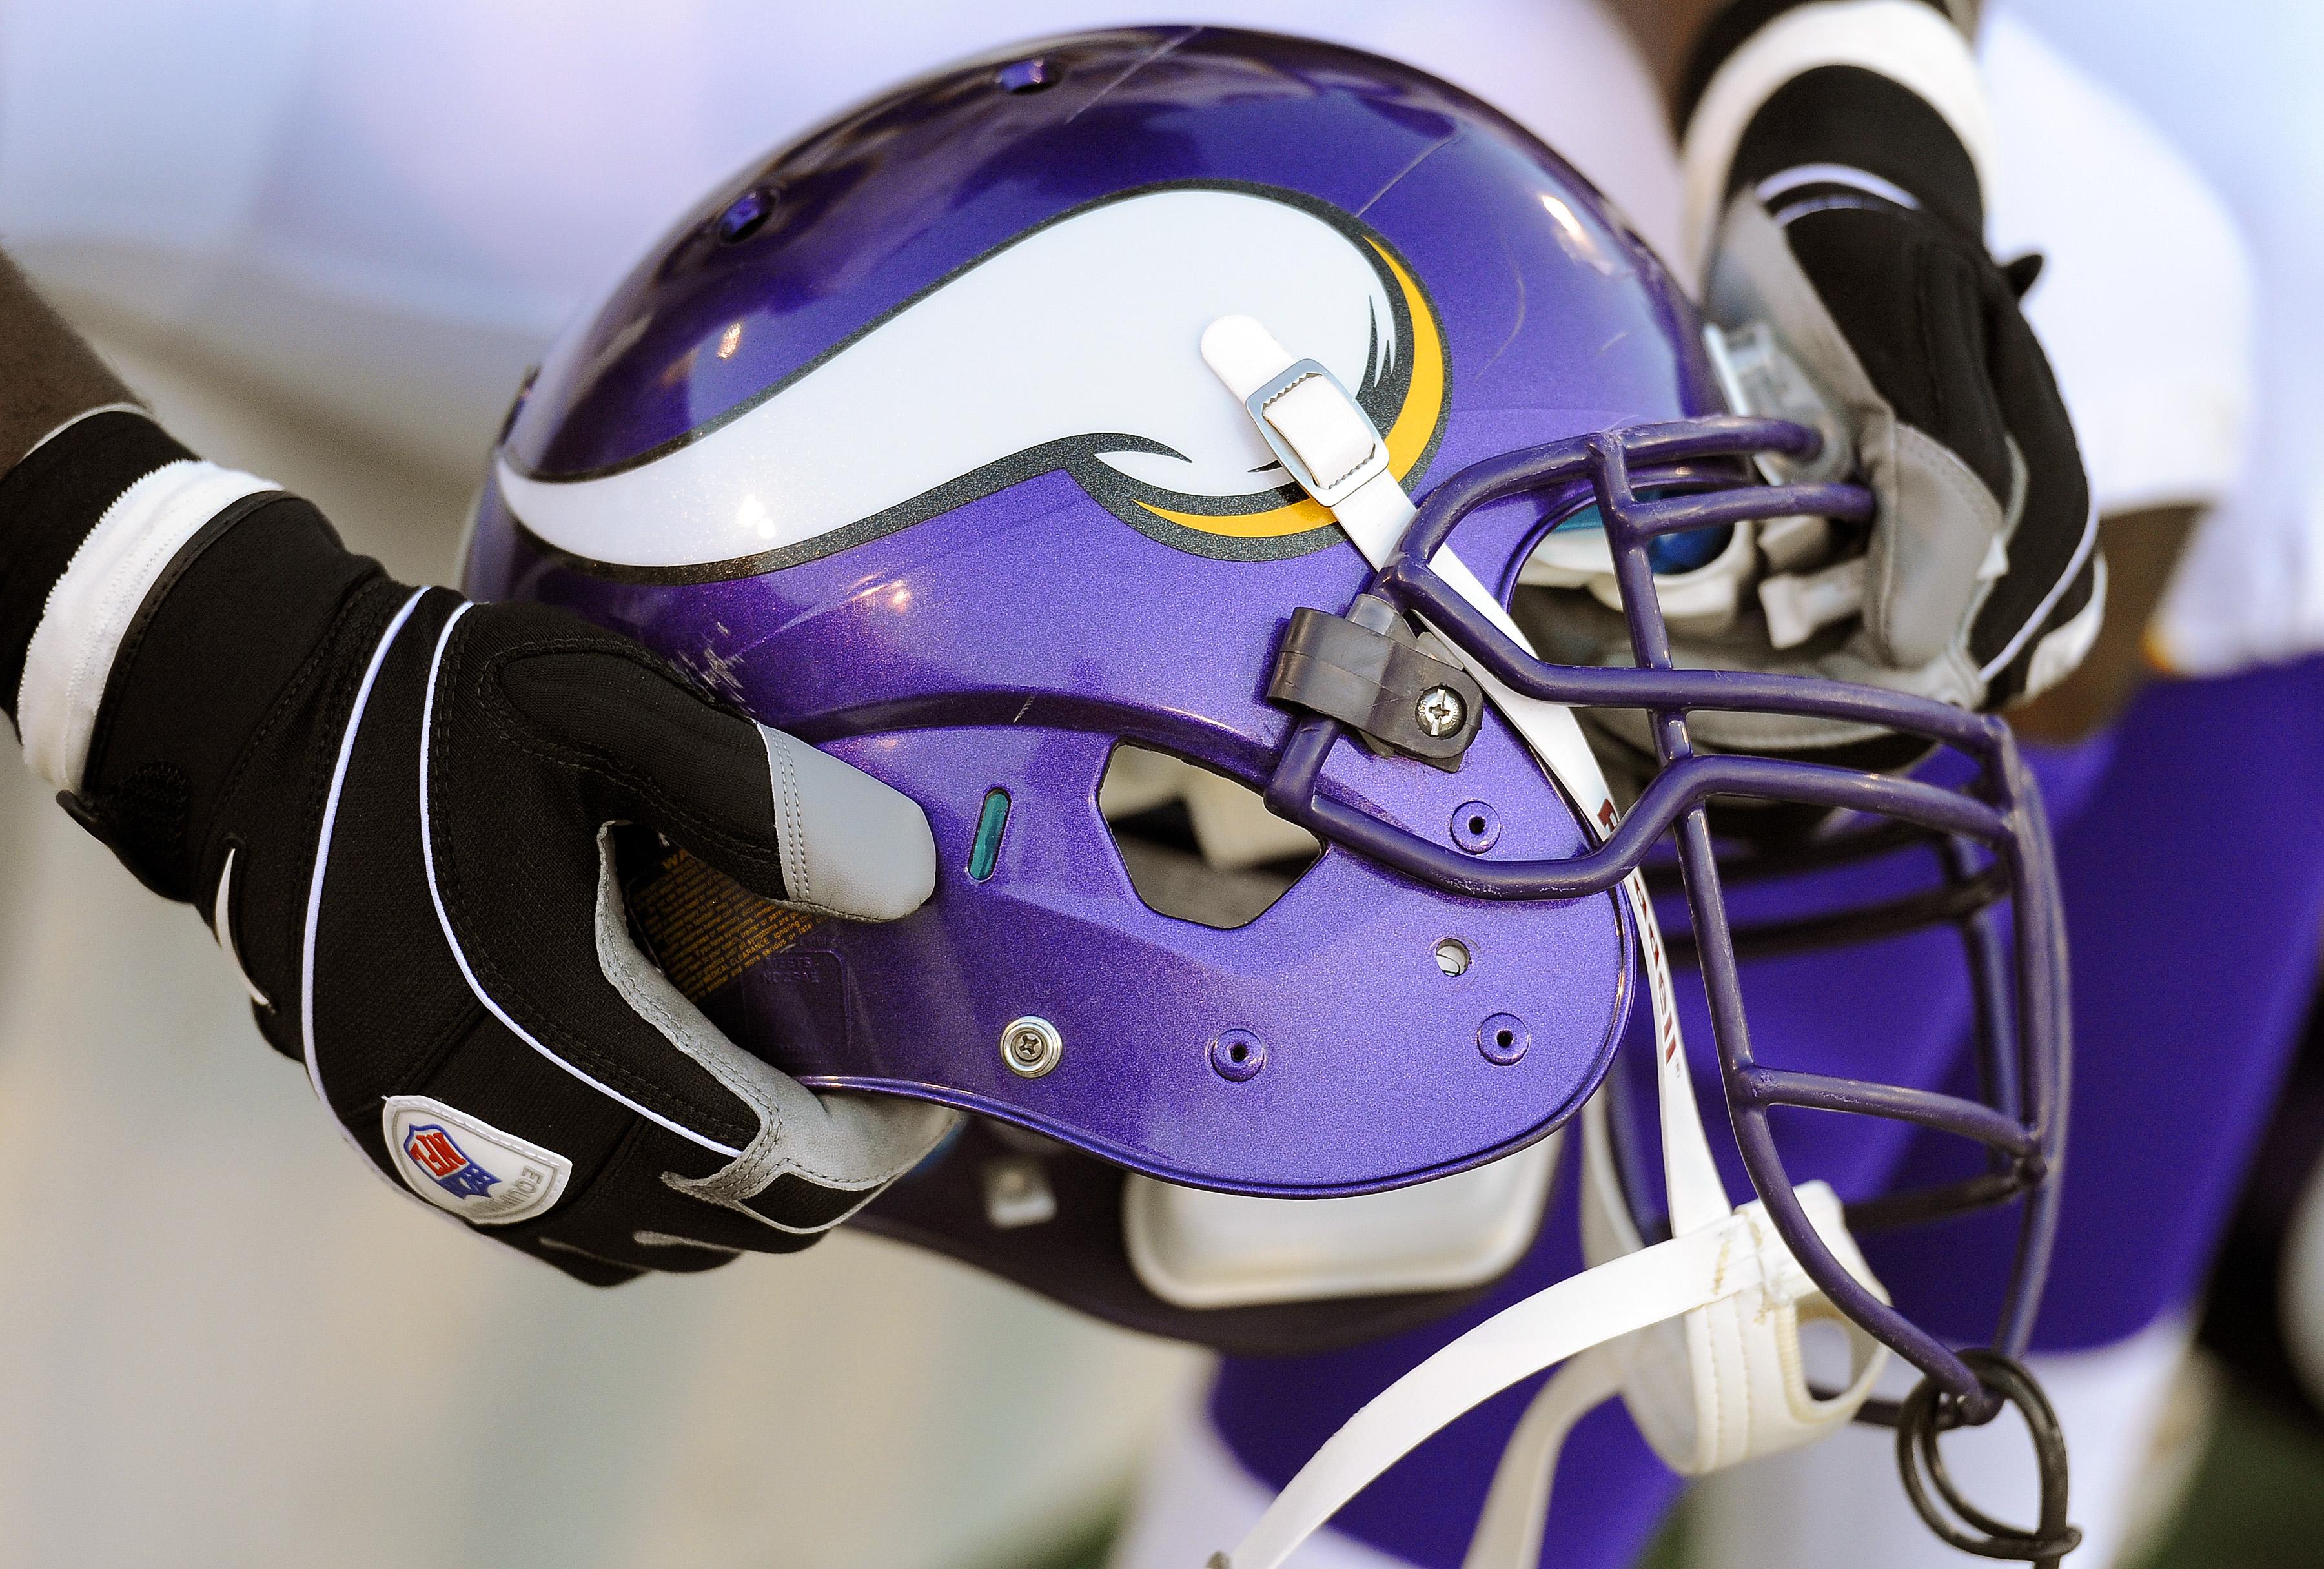 Are These New Minnesota Vikings Helmet Designs Photo